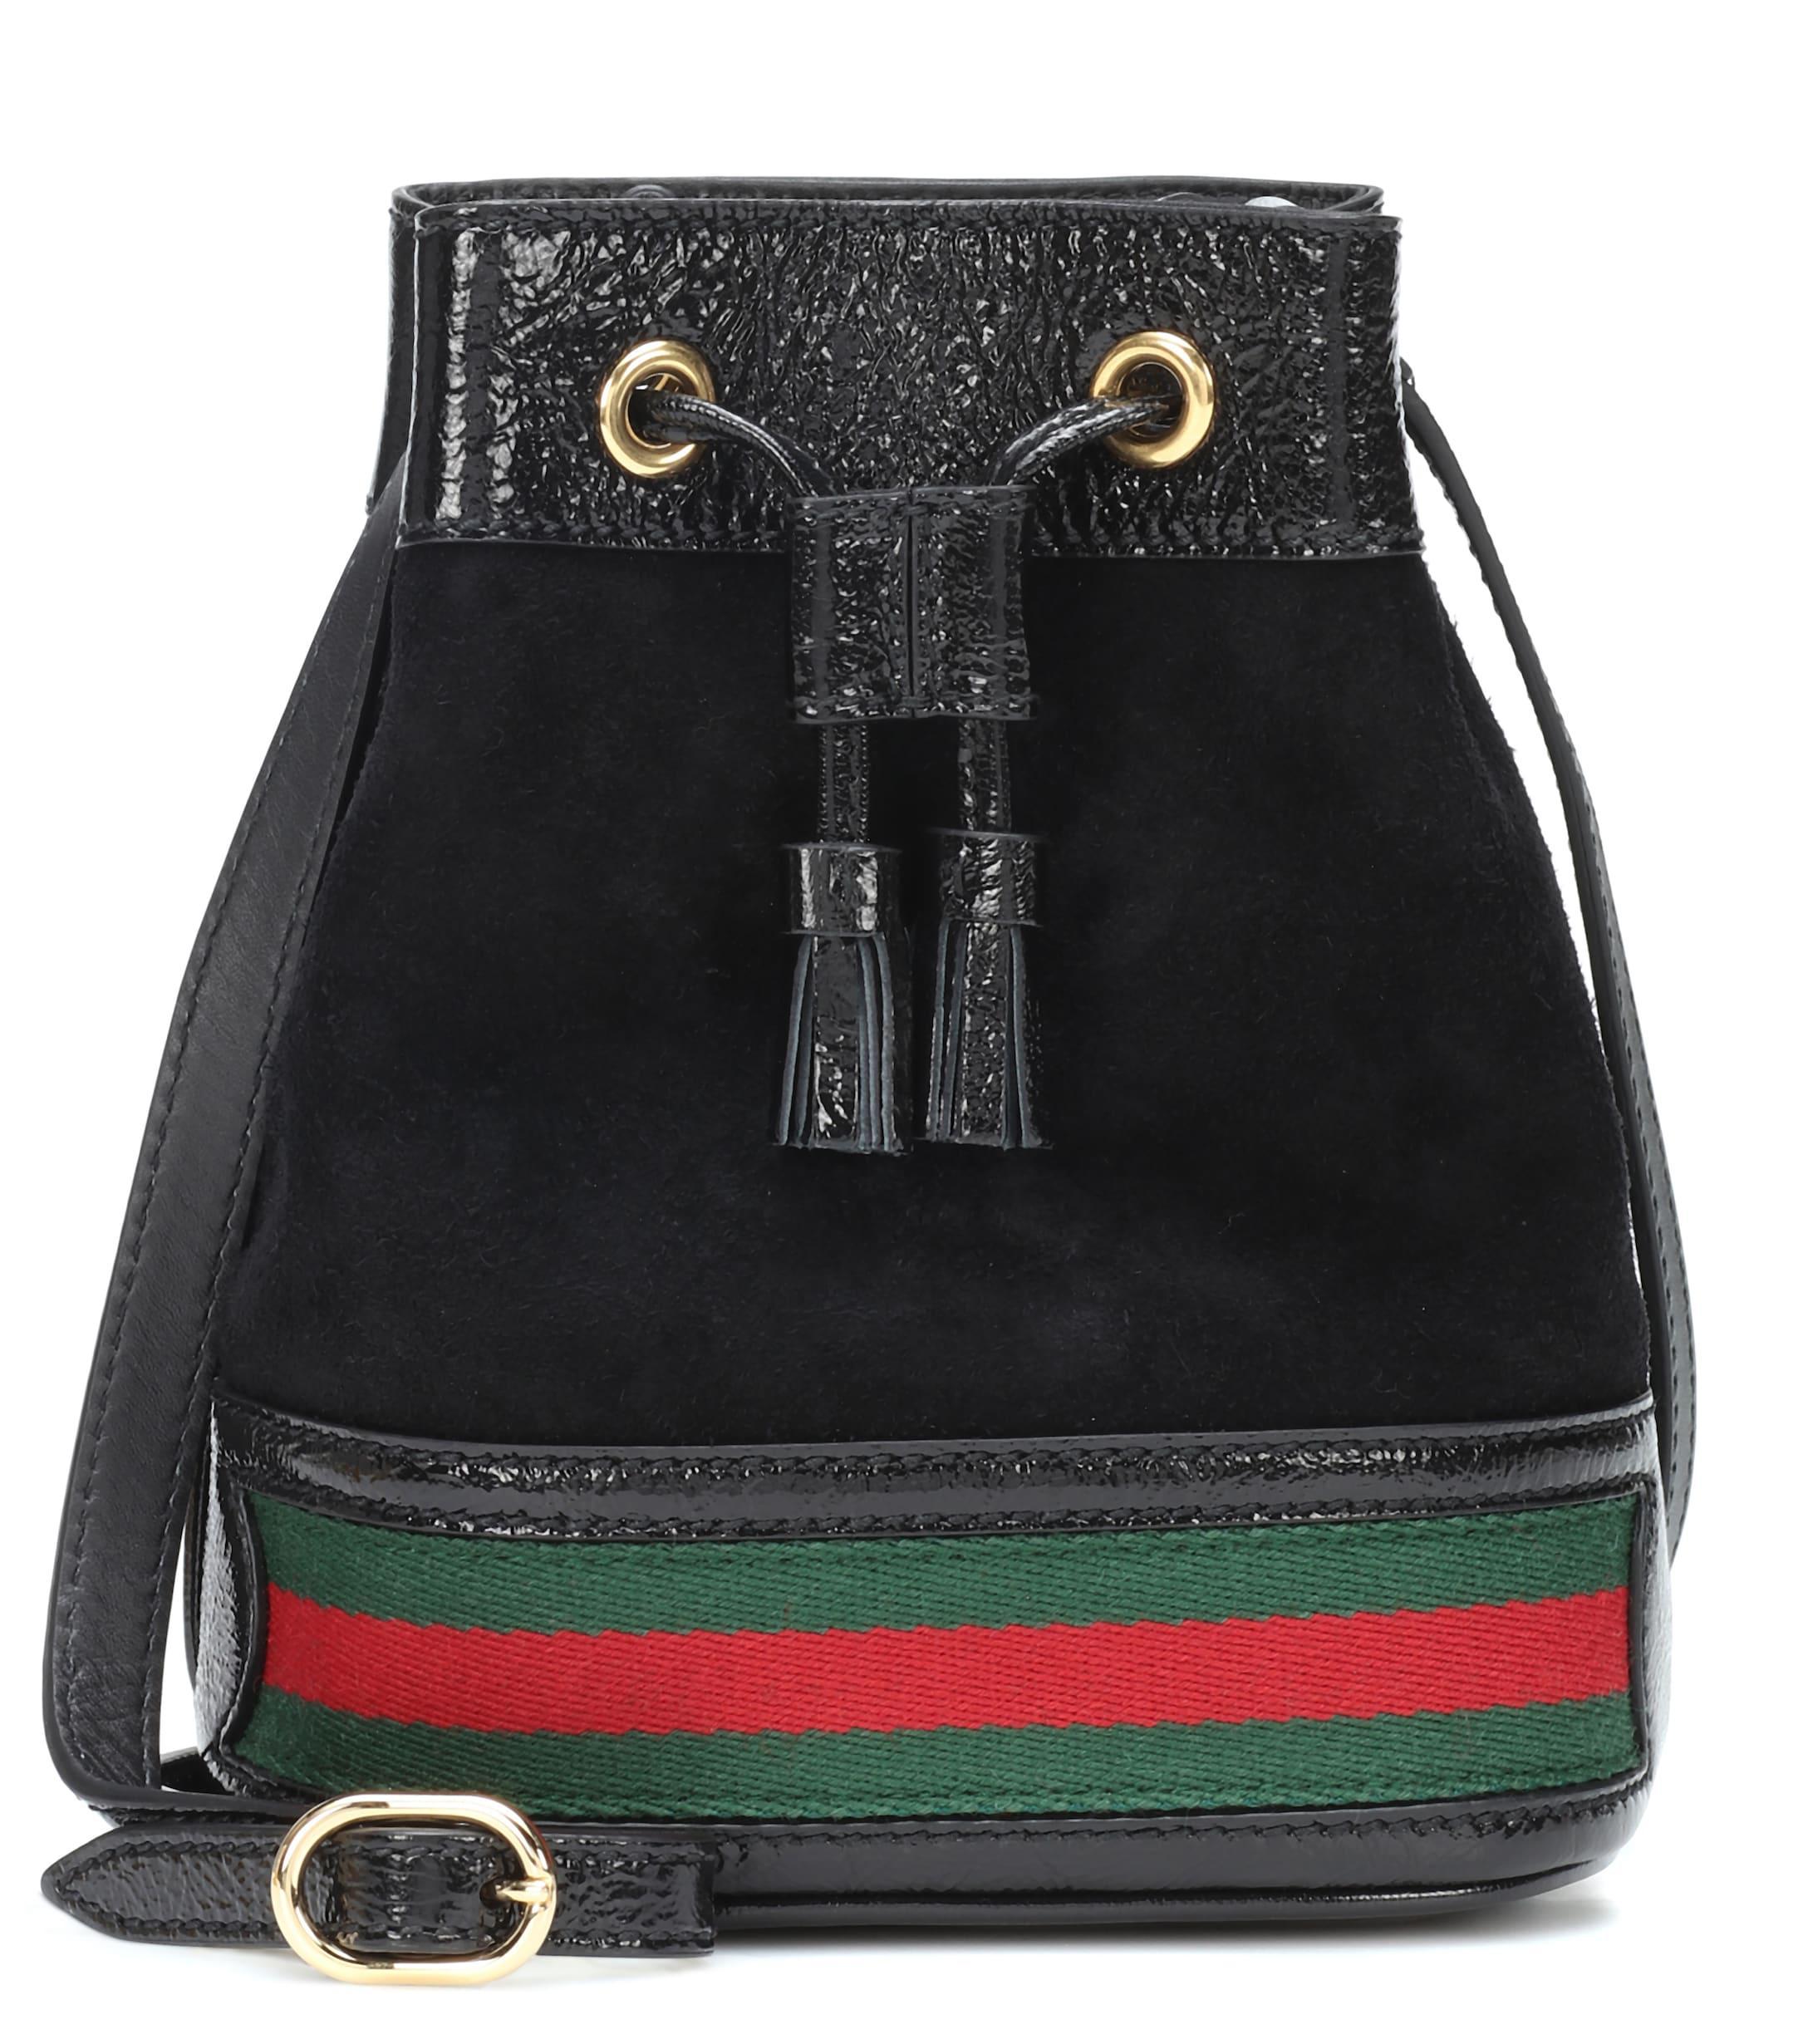 74da223d394 Lyst - Gucci Ophidia Leather Bucket Bag in Black